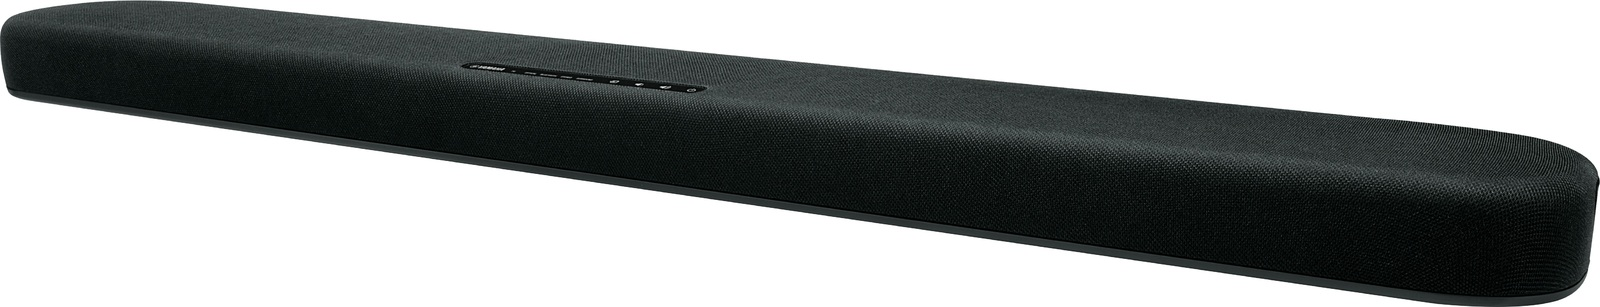 Yamaha: SR-B20AB Sound Bar With Bluetooth image